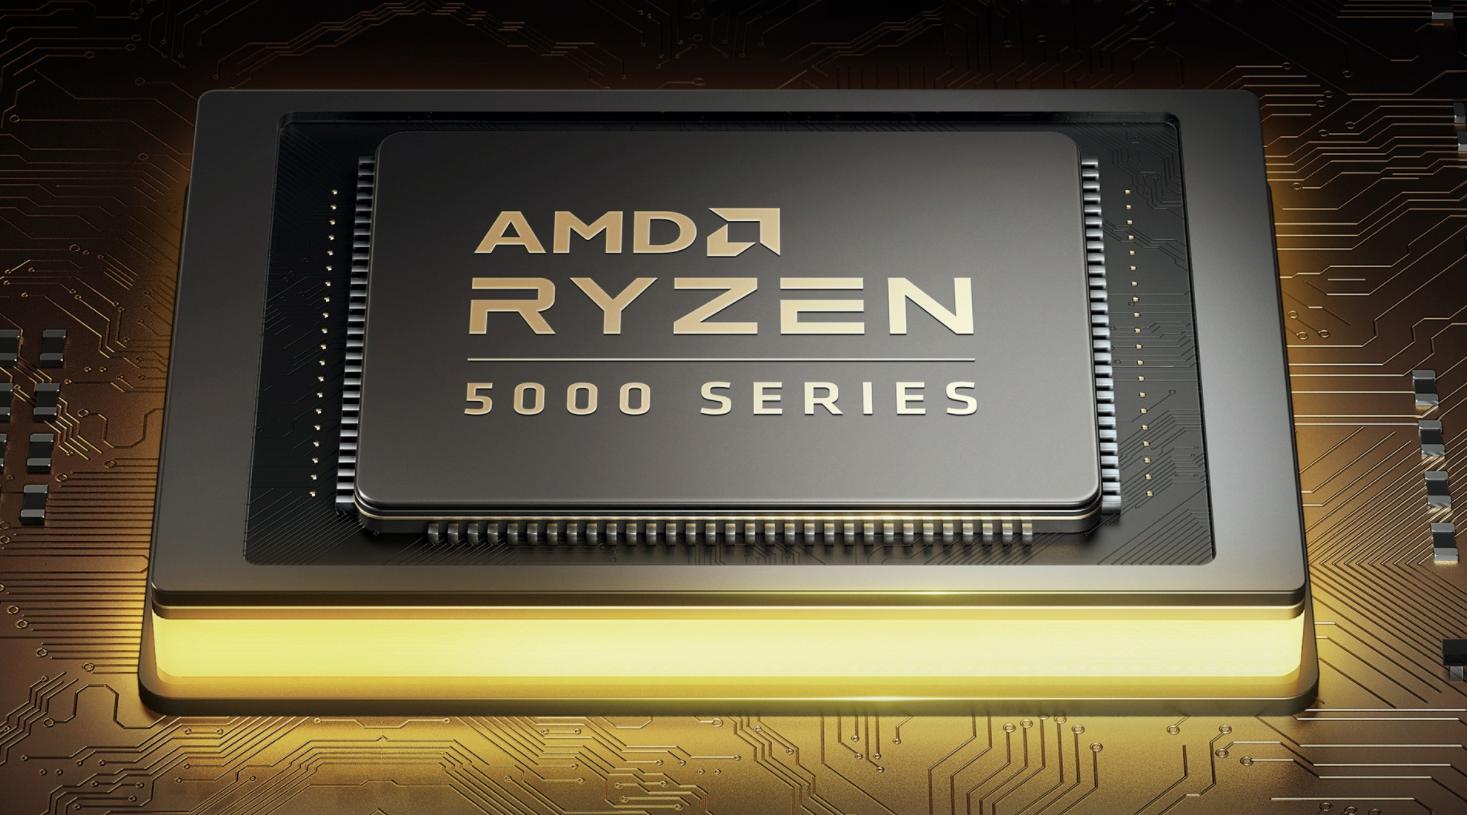 amd-ryzen-9-5980hx-cezanne-flagship-benchmarked,-comes-close-to-intel's-core-i9-11980hk-tiger-lake-flagship